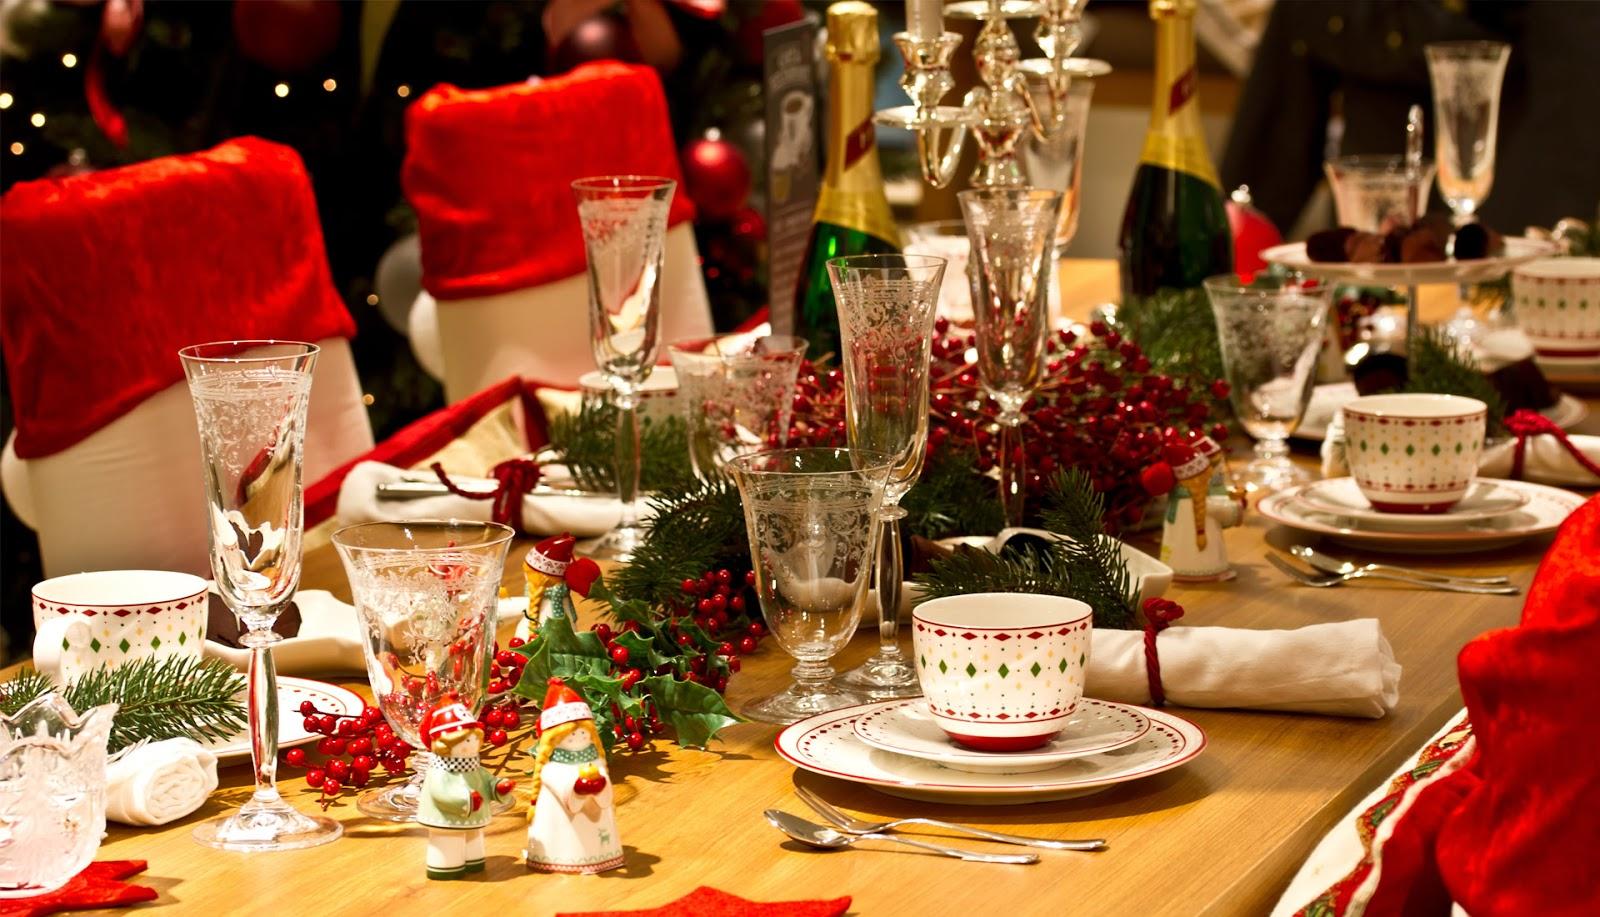 List of Restaurants Open on Christmas Day 2017 | Merry Christmas ...